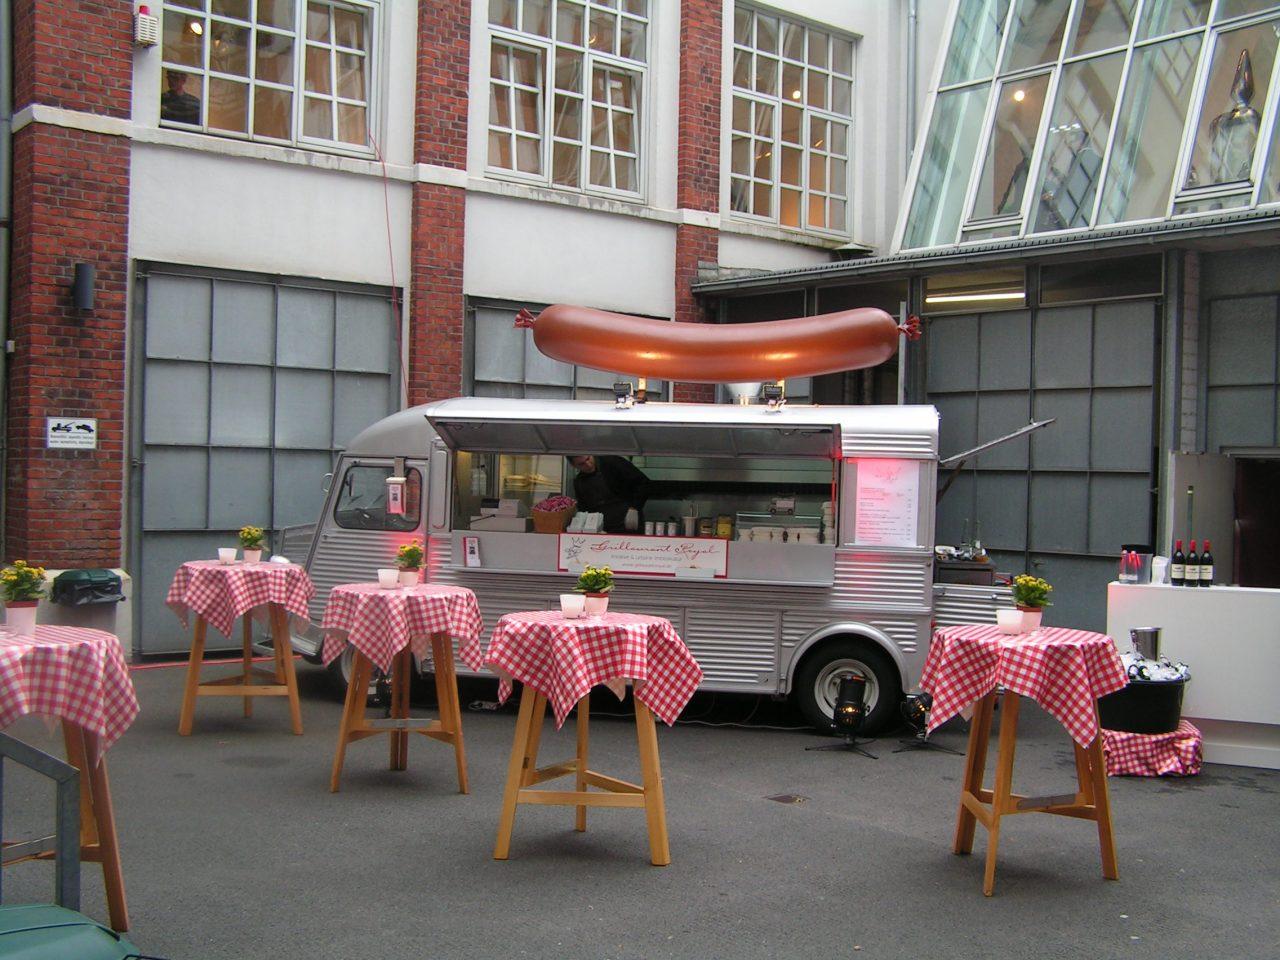 Grillaurant Royal